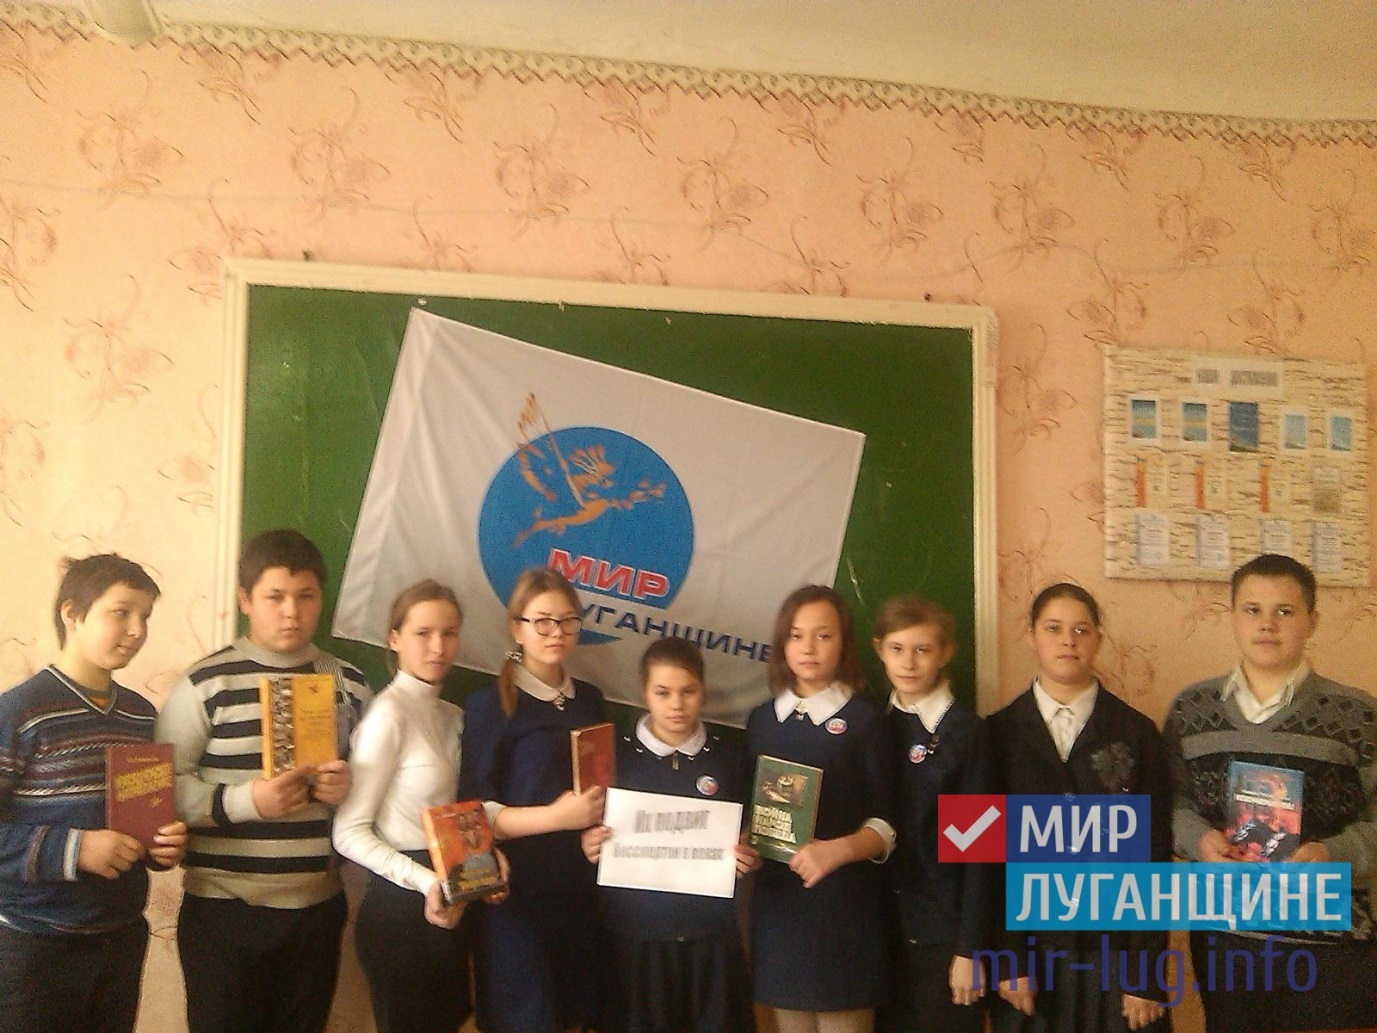 Урок мужества прошел в школе поселка Малоивановка 1